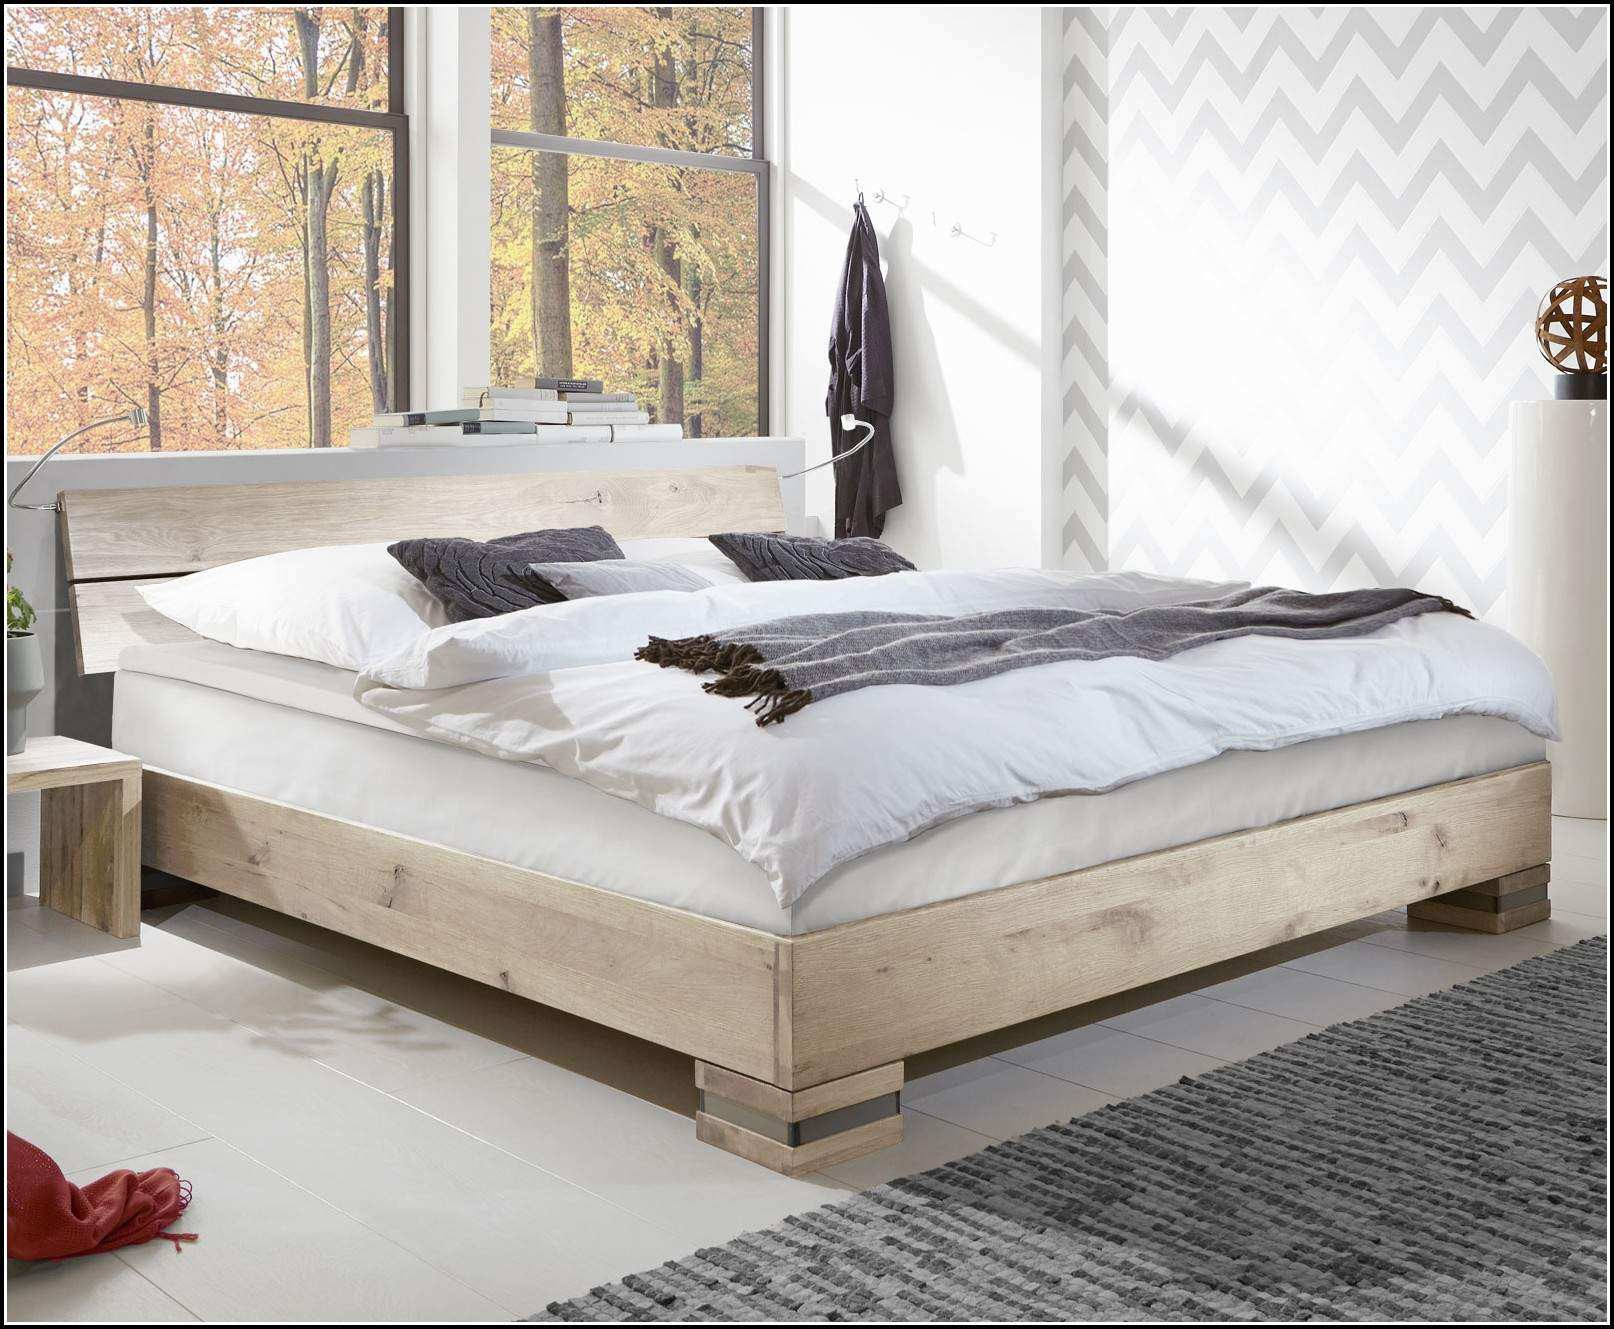 Bett Komplett  Bett 140x200 Komplett WaterSoftnerGuide